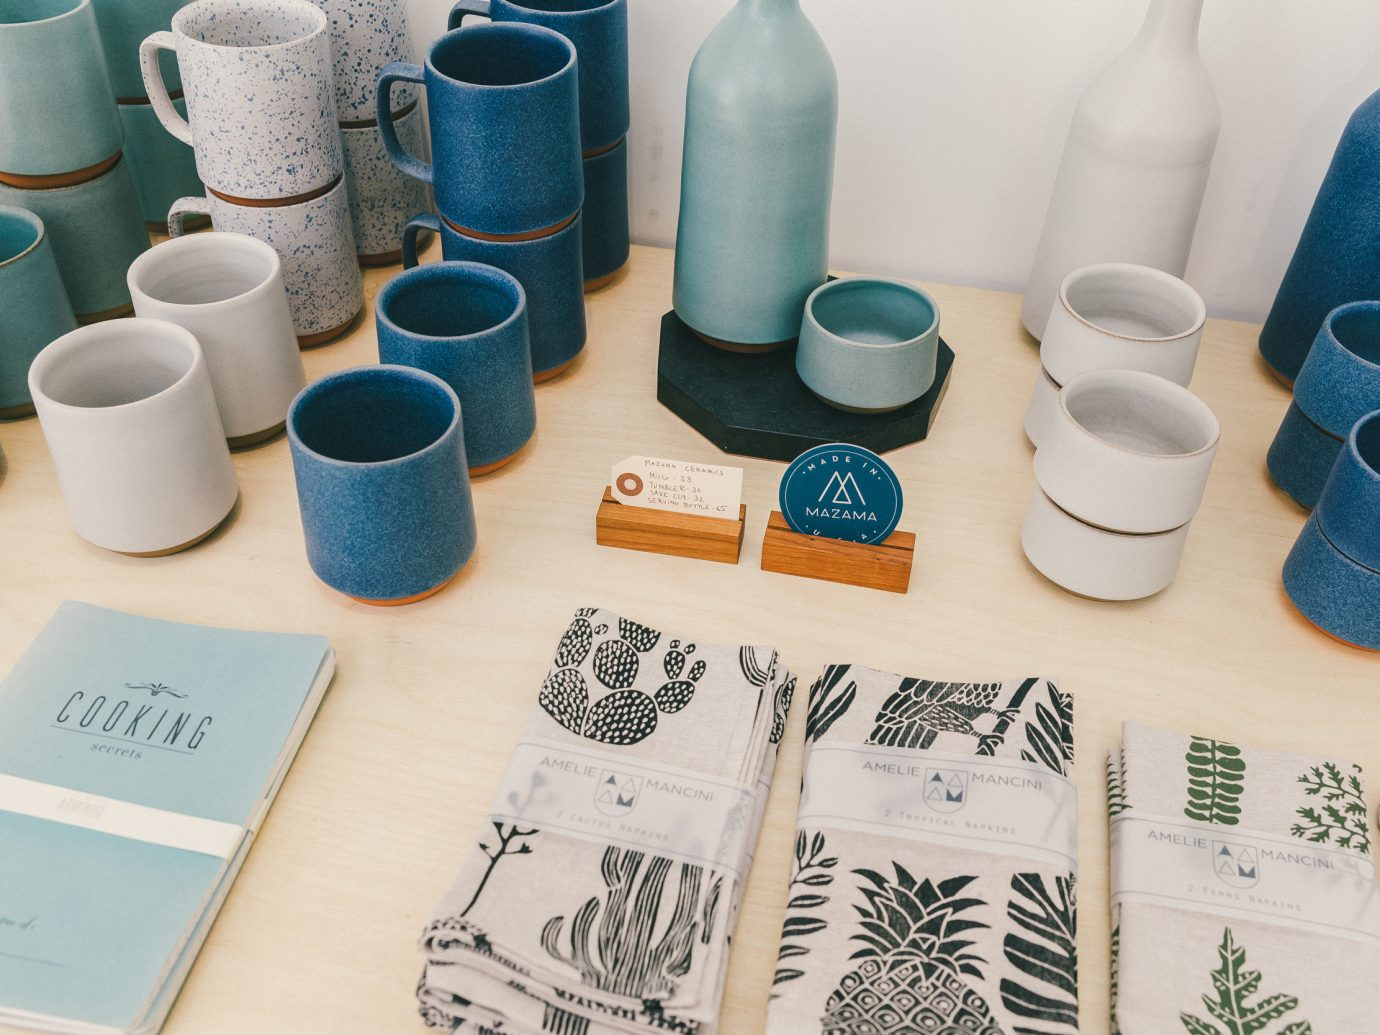 City Trip Ideas Weekend Getaways indoor cup ceramic product design plastic product drinkware